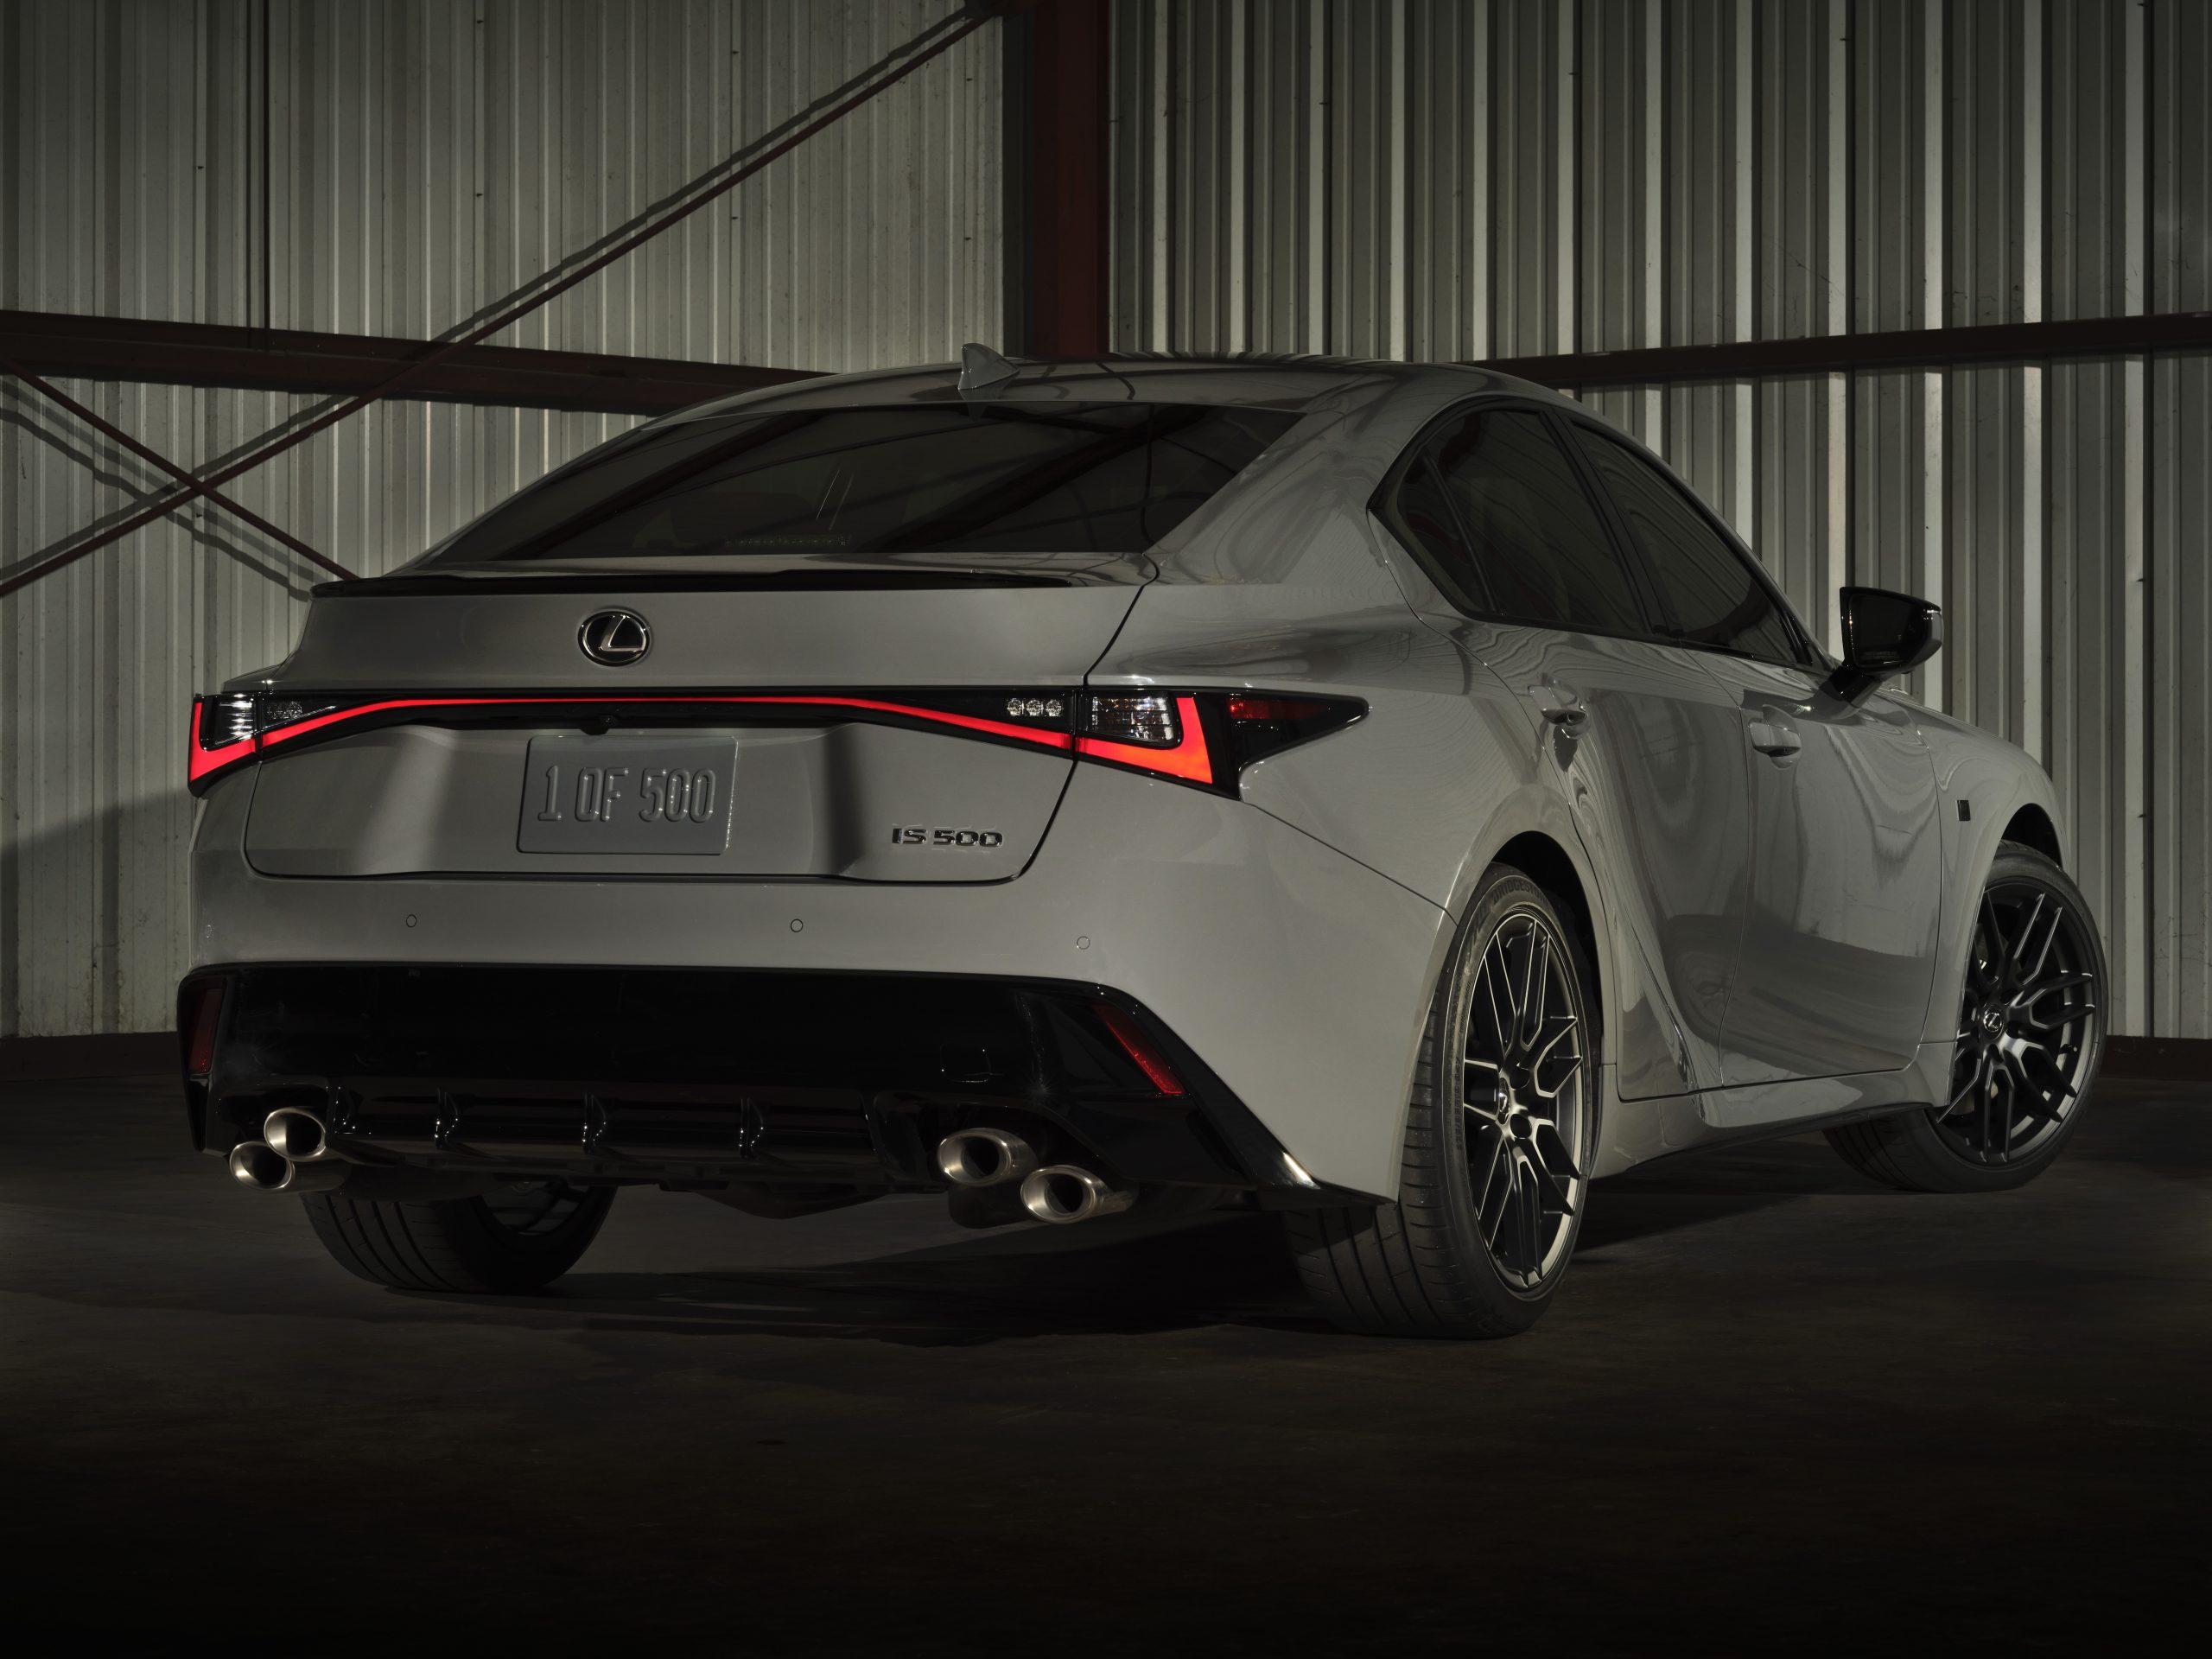 2022 Lexus IS 500 F Sport Launch Edition rear three quarter